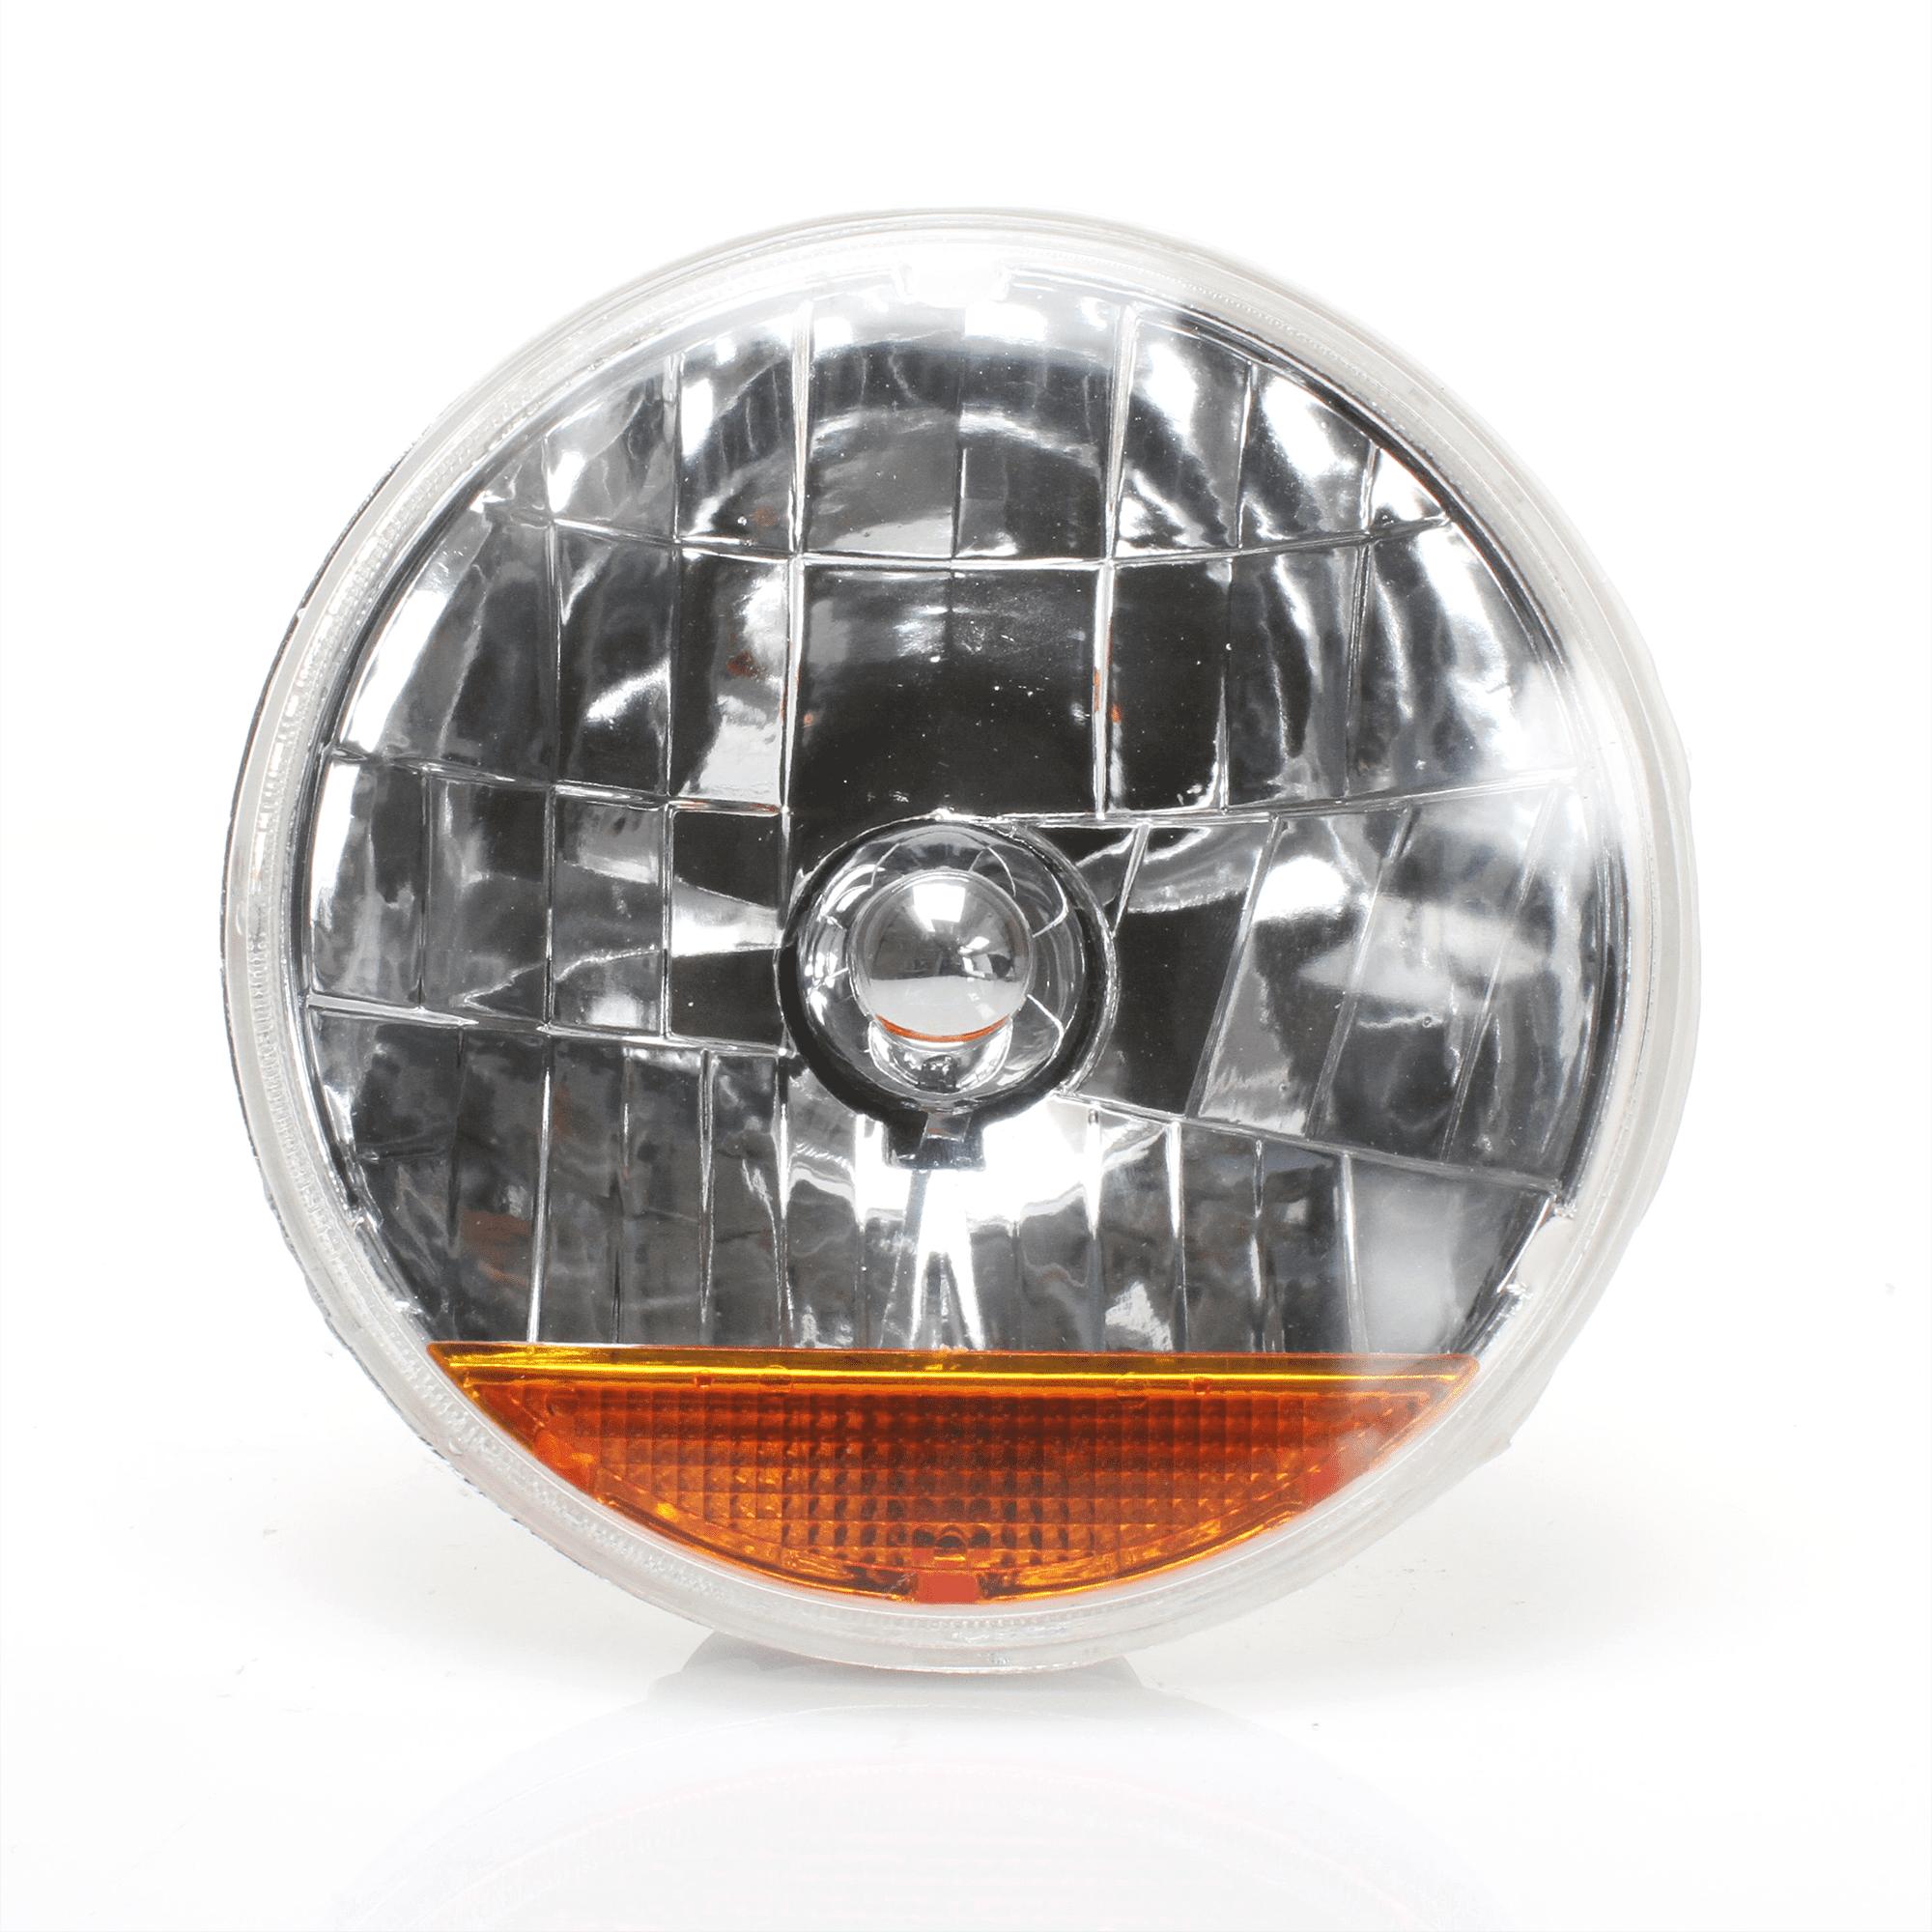 "AutoLoc Snake-eye 7"" Inch Halogen Lens Assembly  W/ Amber Turn Signal"